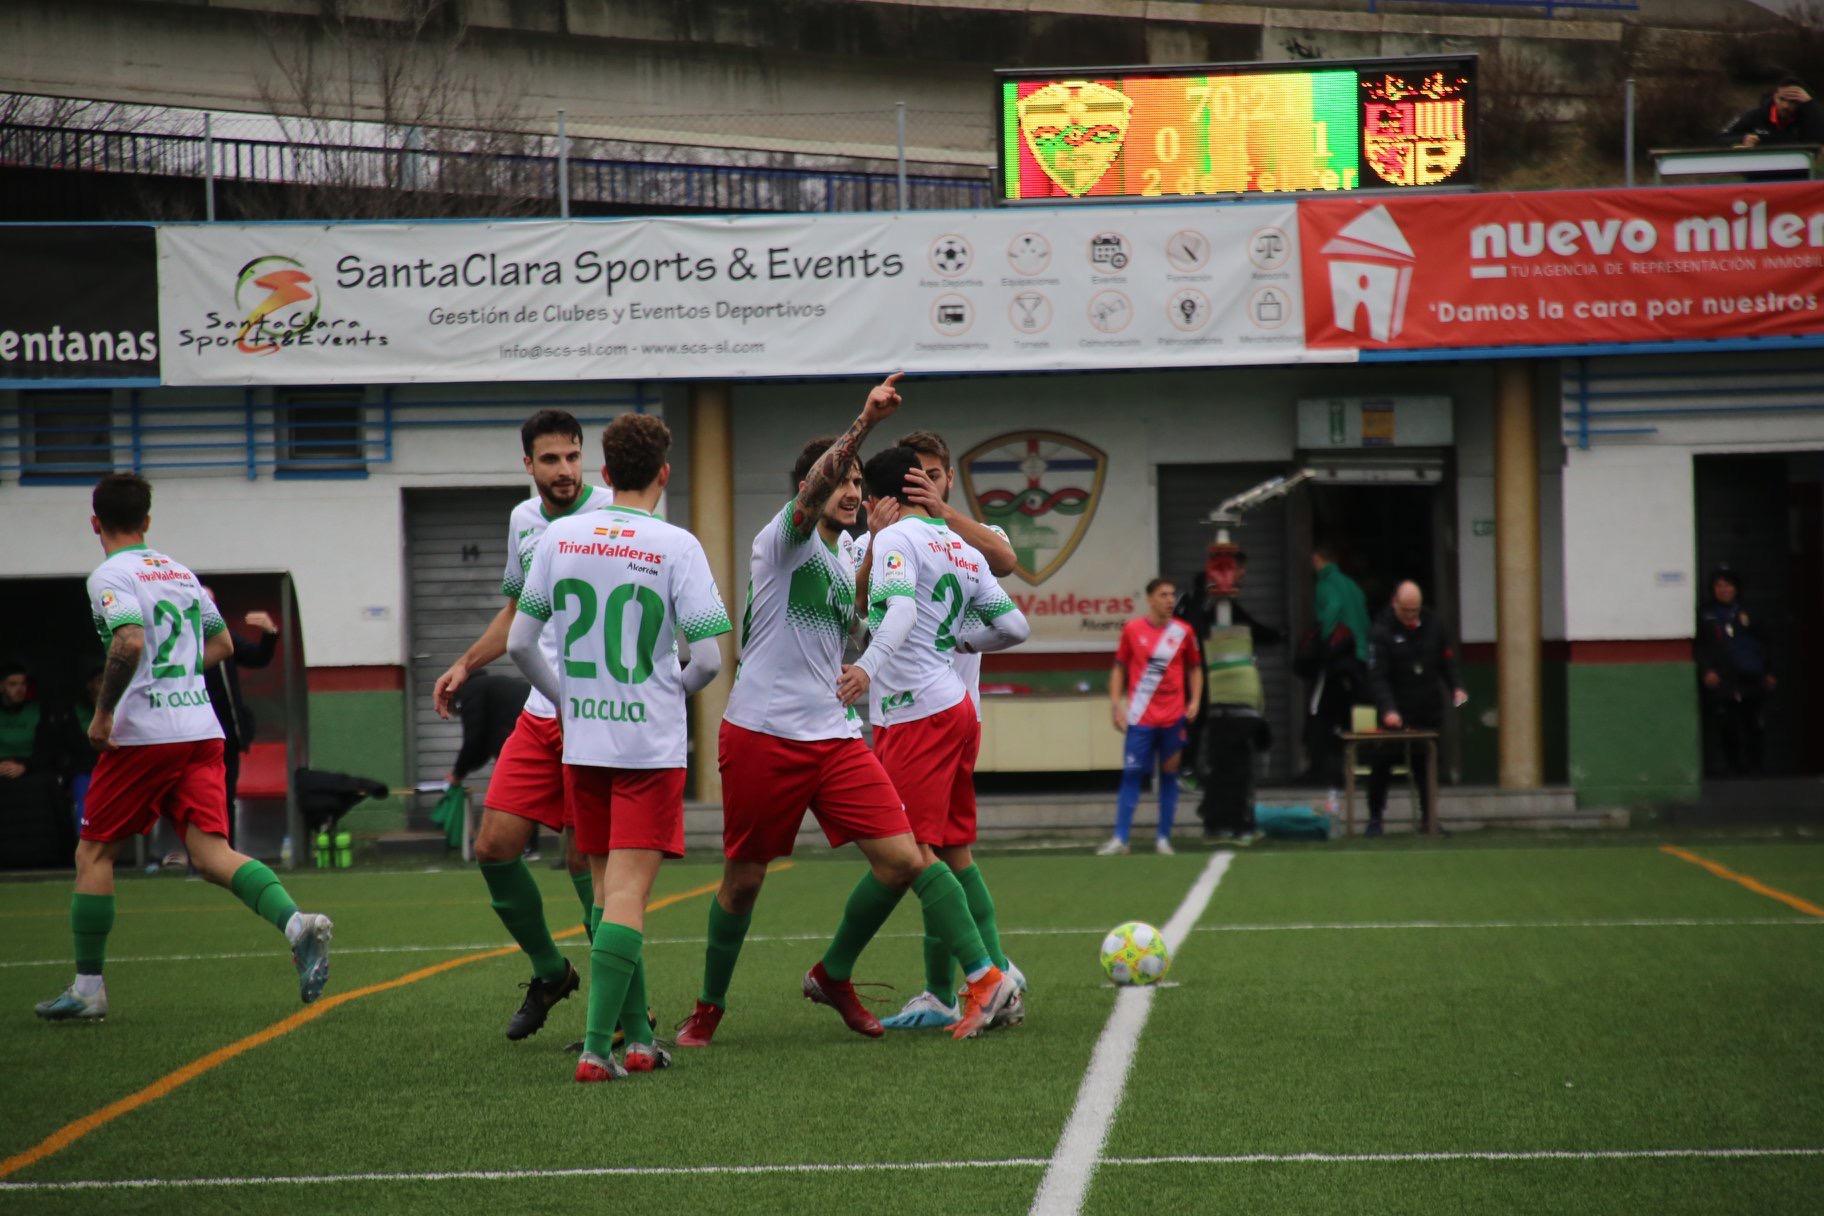 CRÓNICA TERCERA | Segunda derrota consecutiva frente al Torrejón